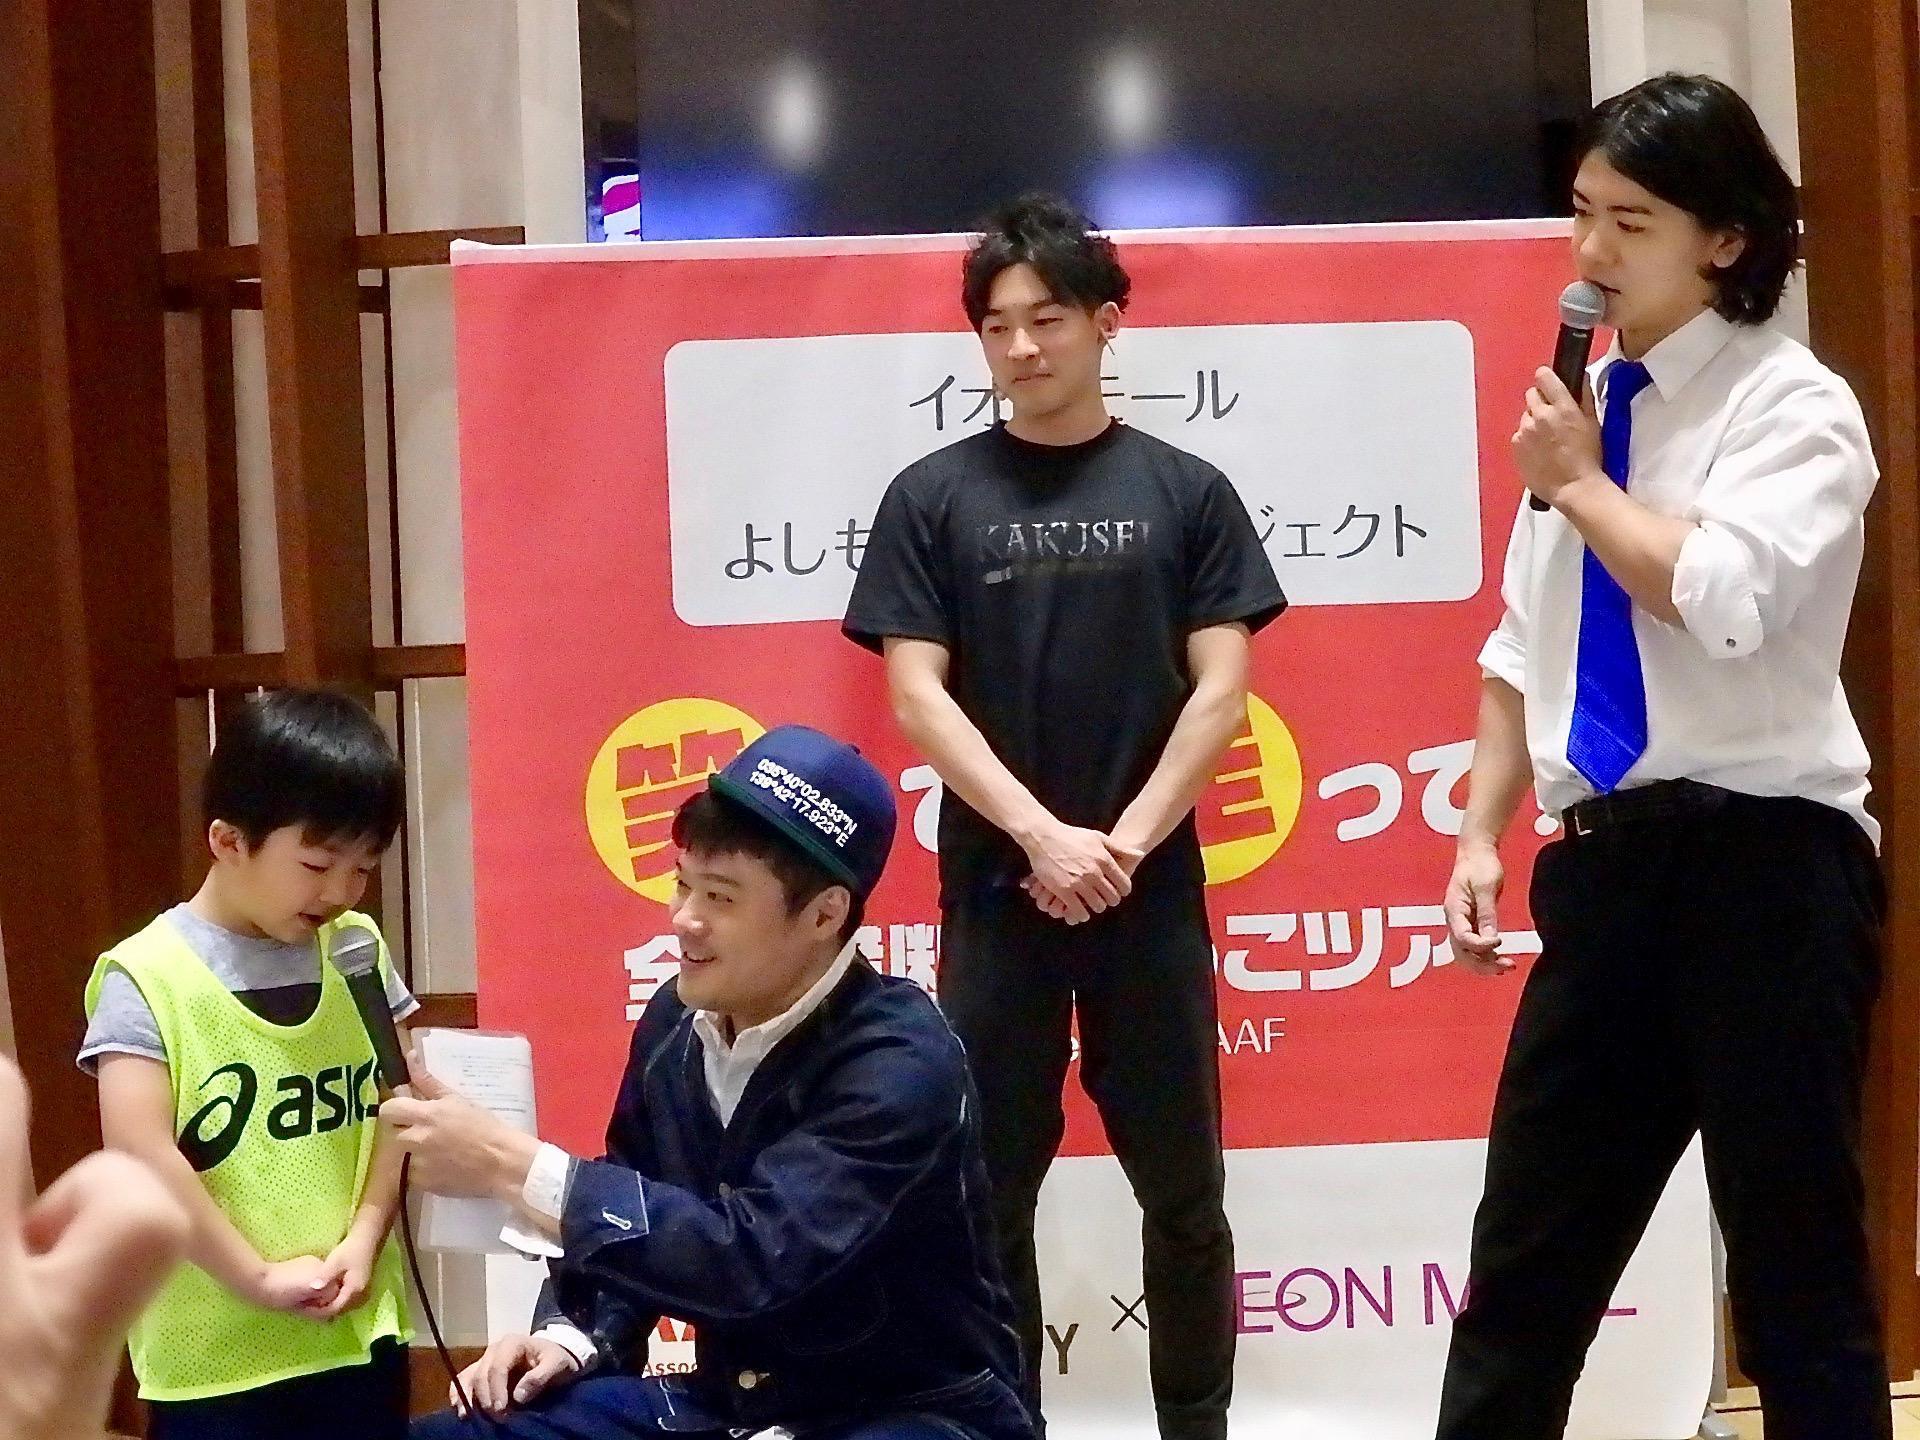 http://news.yoshimoto.co.jp/20180211194829-dd50f3f676da622fc00fd7b38725dbd8ee7f3e13.jpg